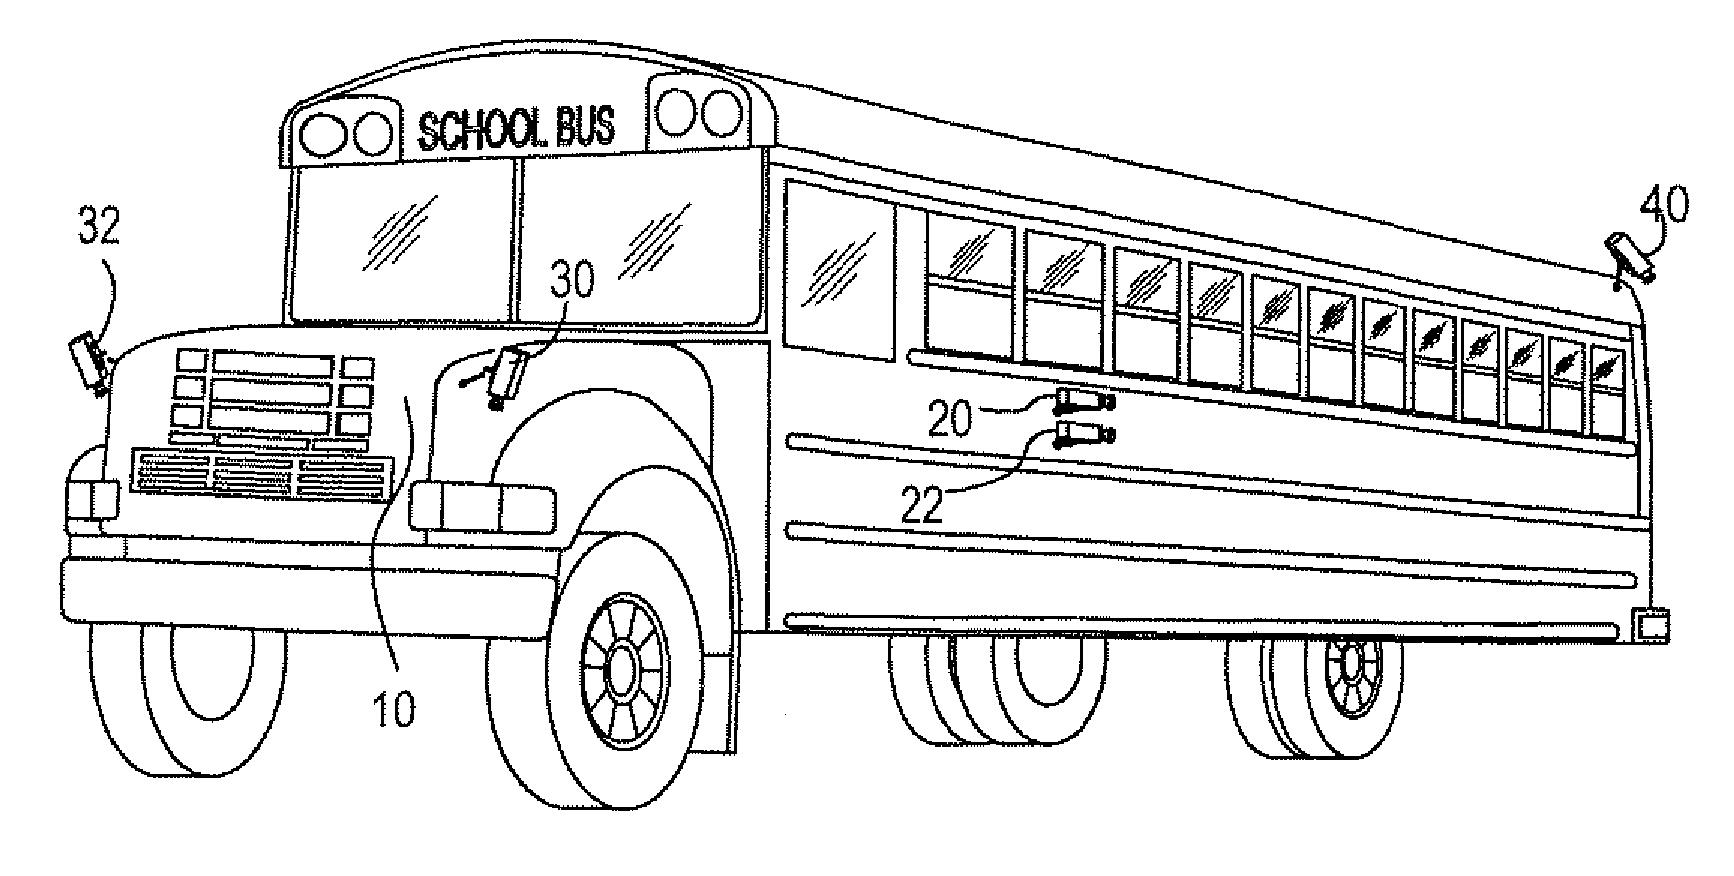 School Bus Clip Art Black And White - ClipArt Best